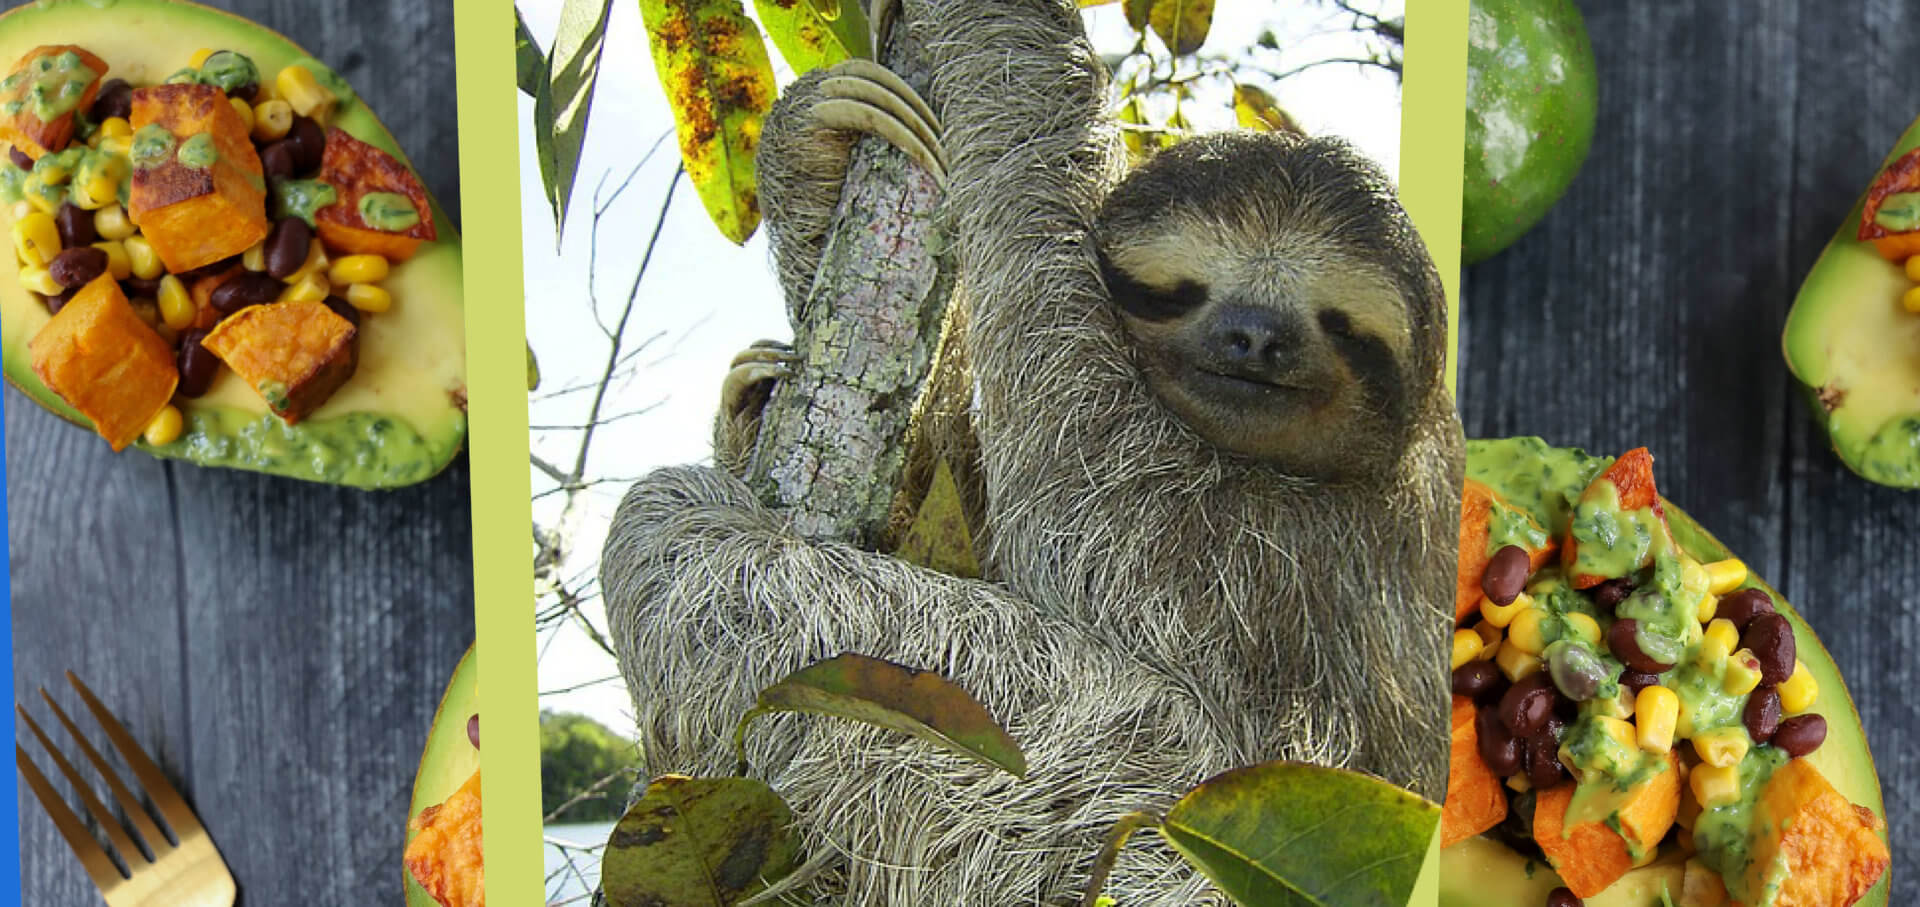 Eat Like a Sloth: Stuffed Tropical Avocados